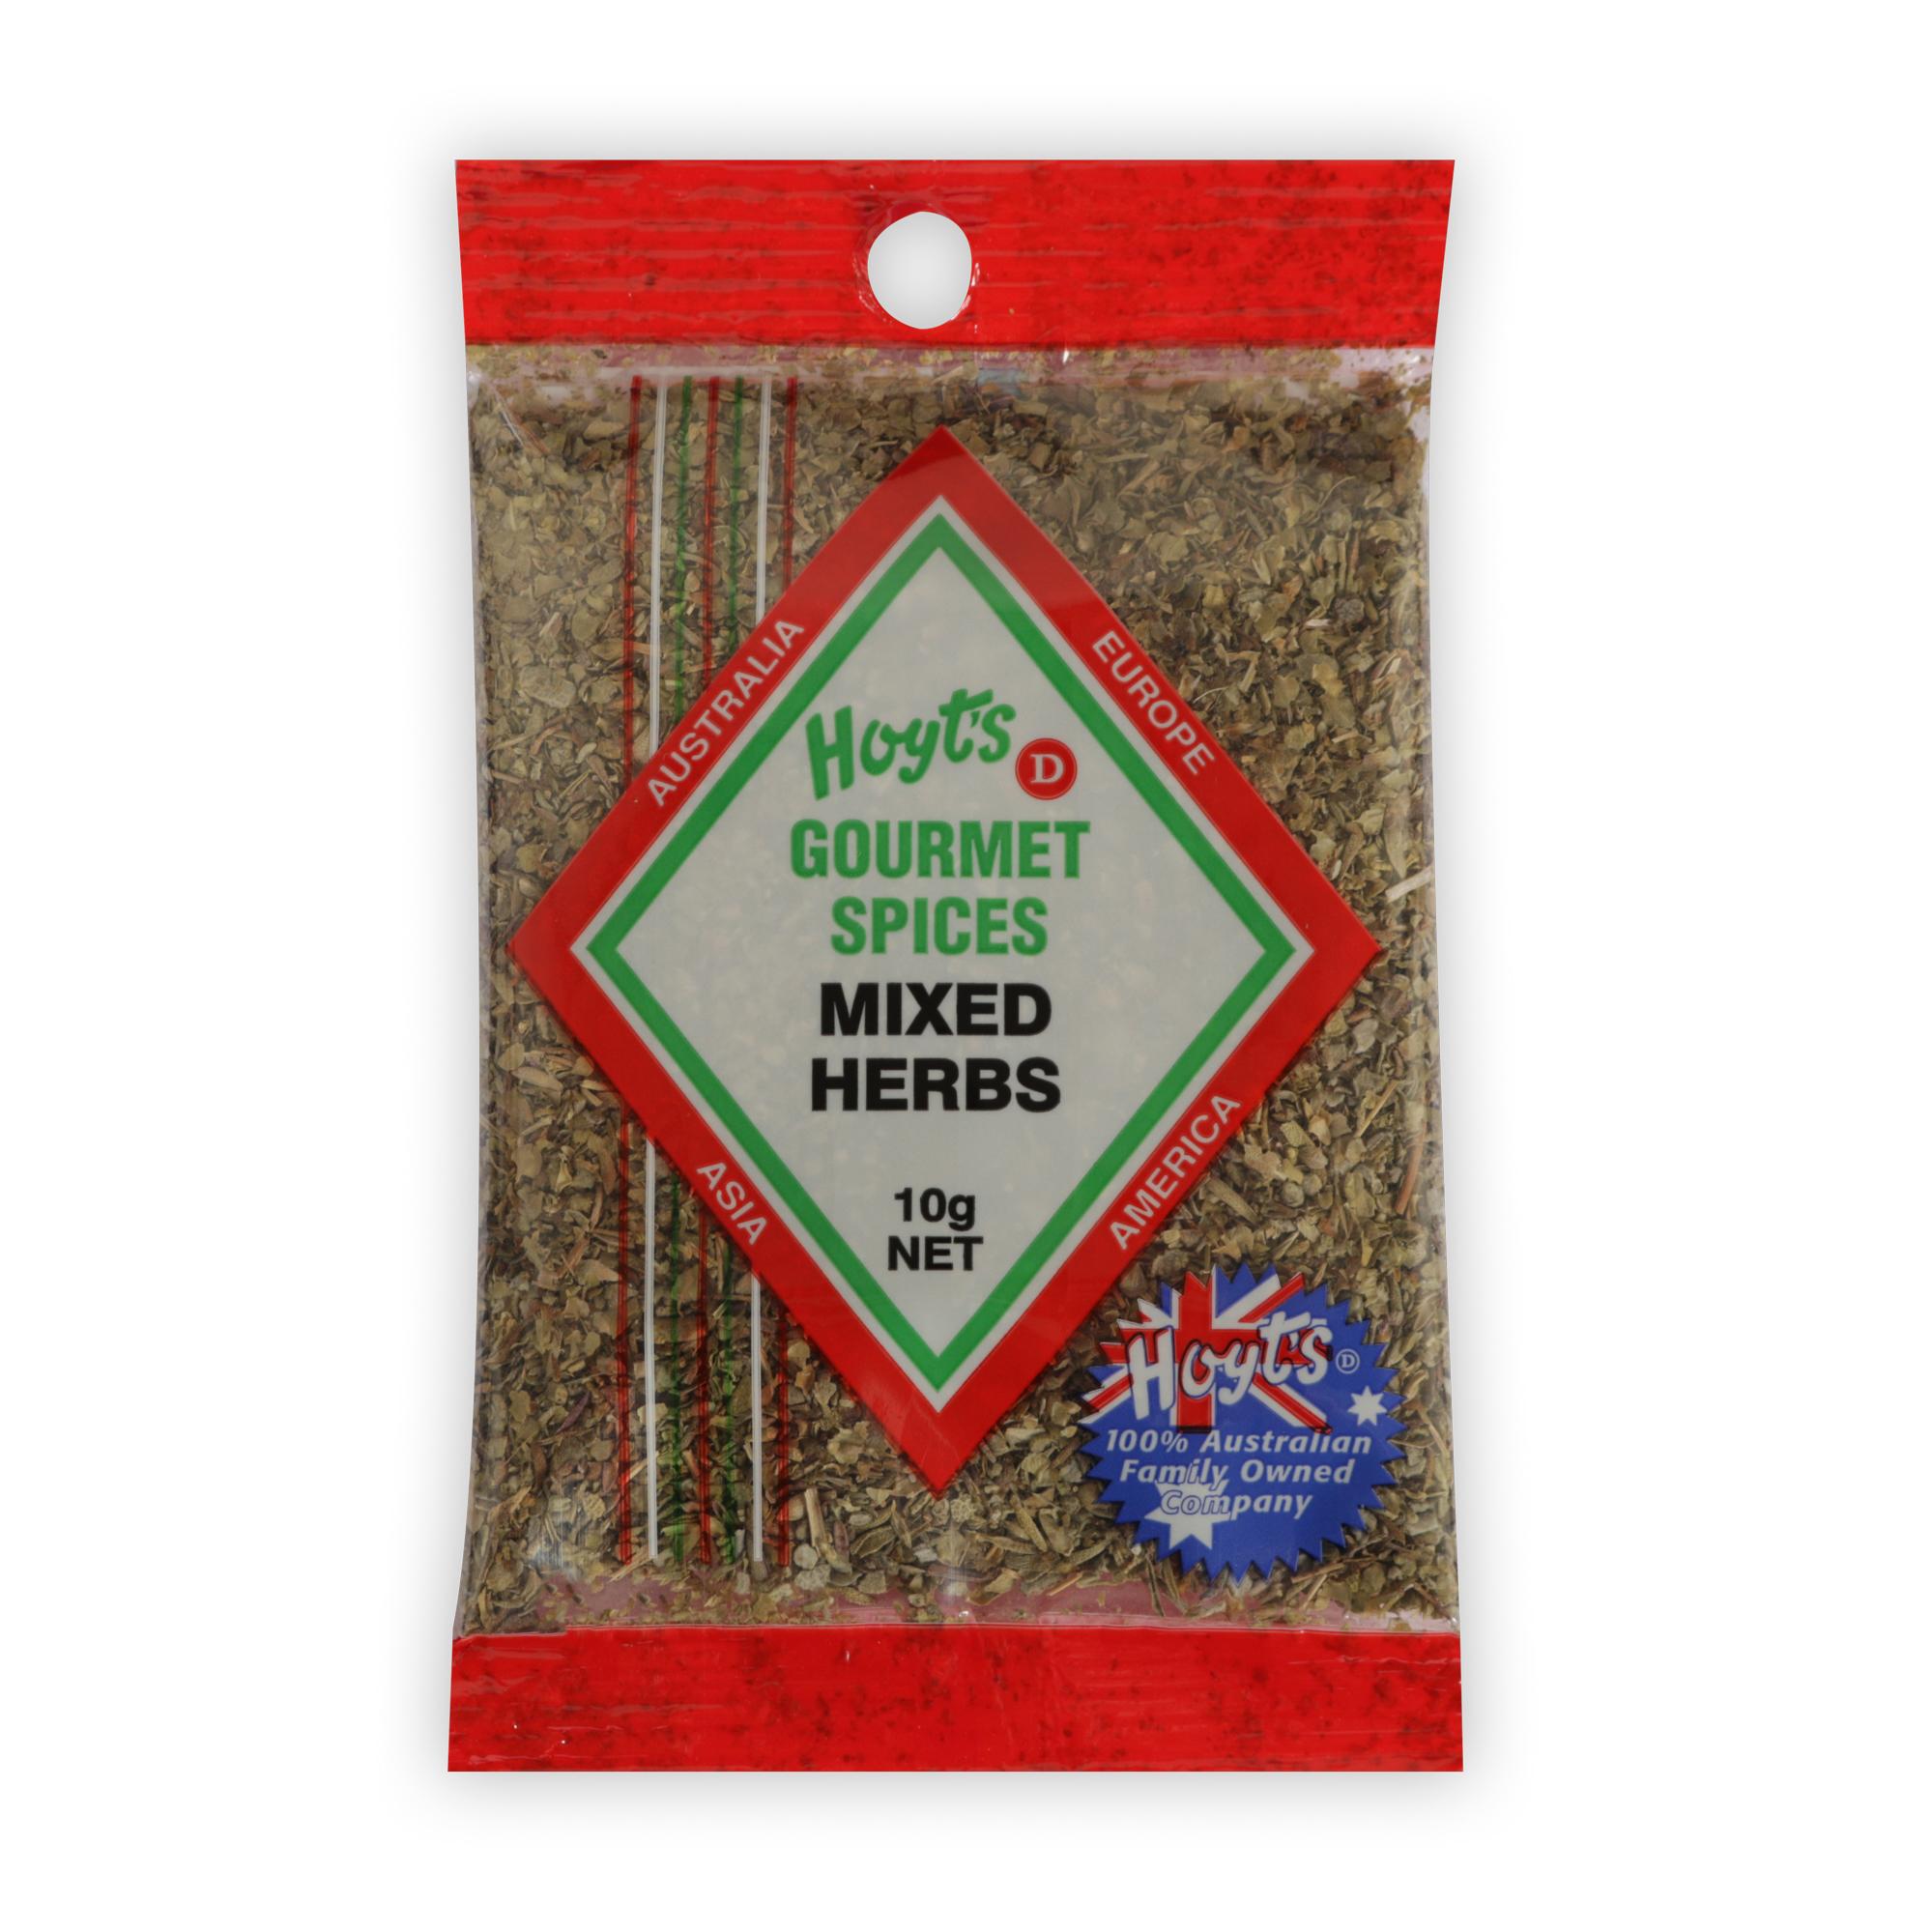 Hoyts Gourmet Mixed Herbs 10g